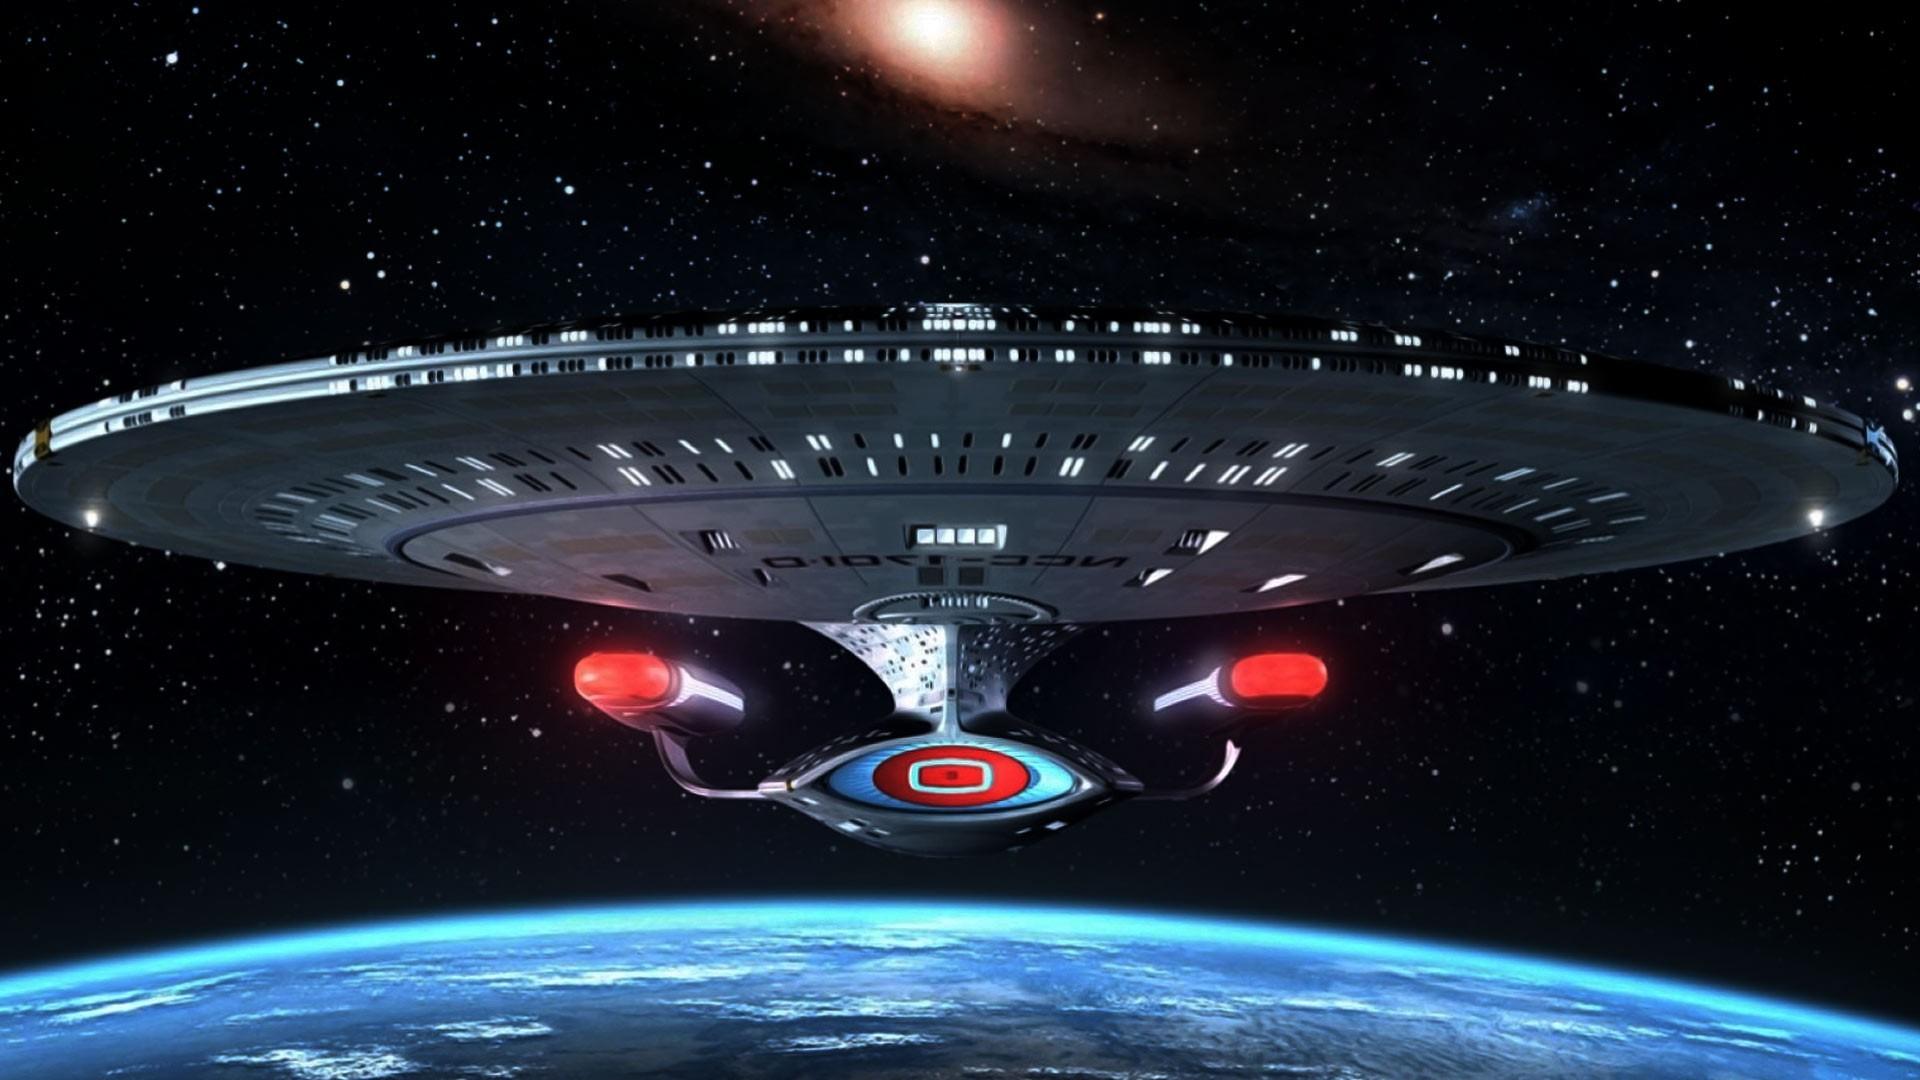 Star Trek, USS Enterprise (spaceship) Wallpapers HD / Desktop and Mobile  Backgrounds